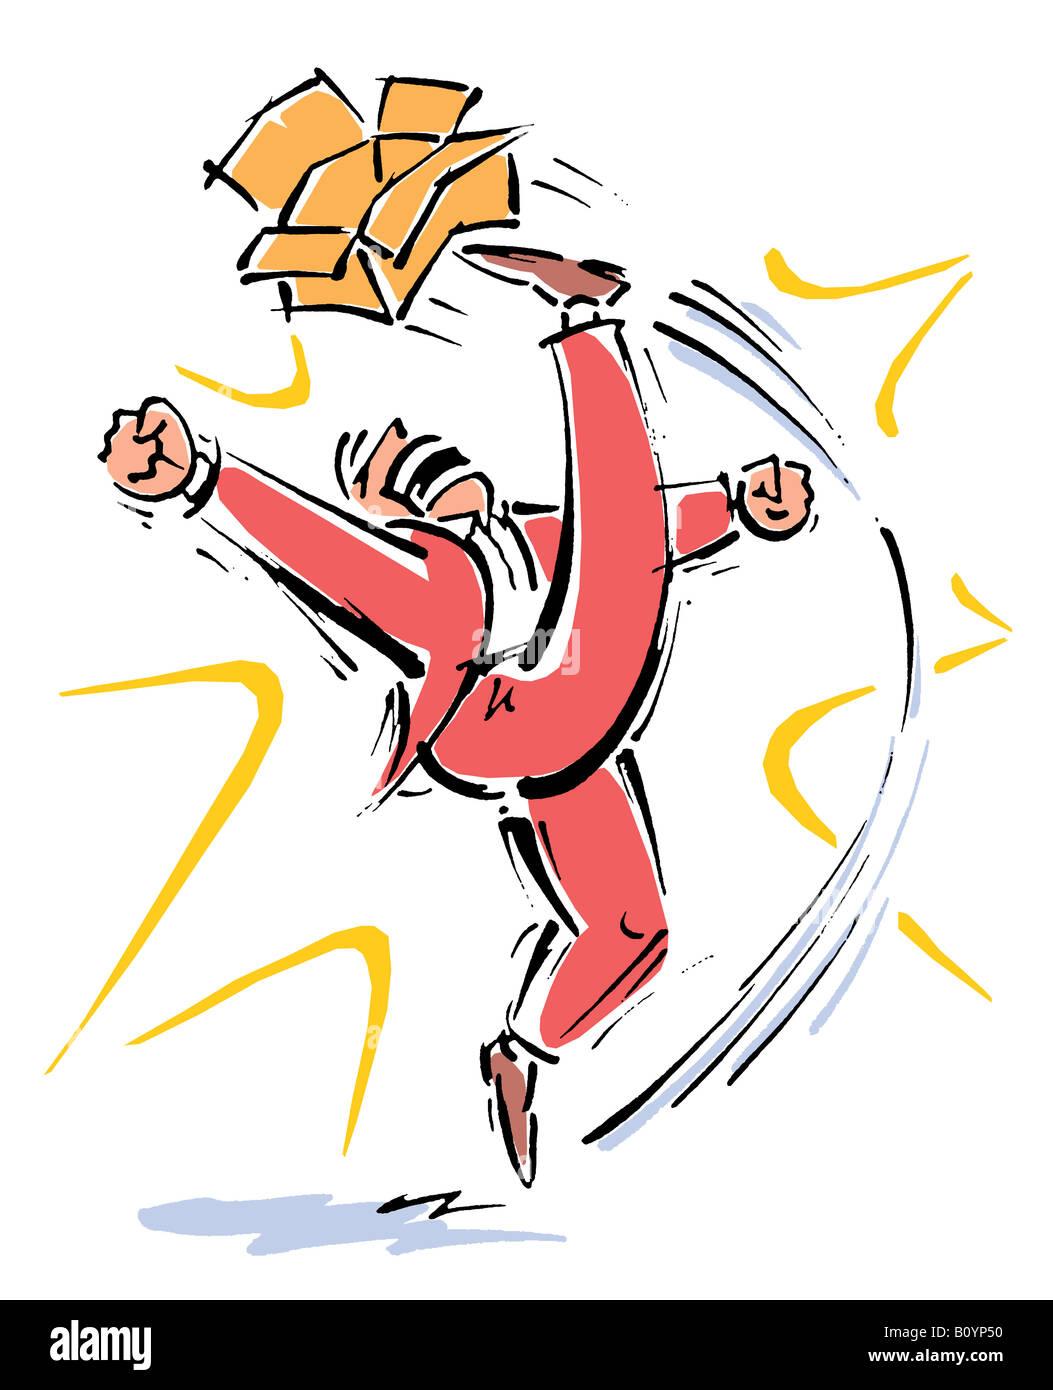 Angry man kicking box - Stock Image